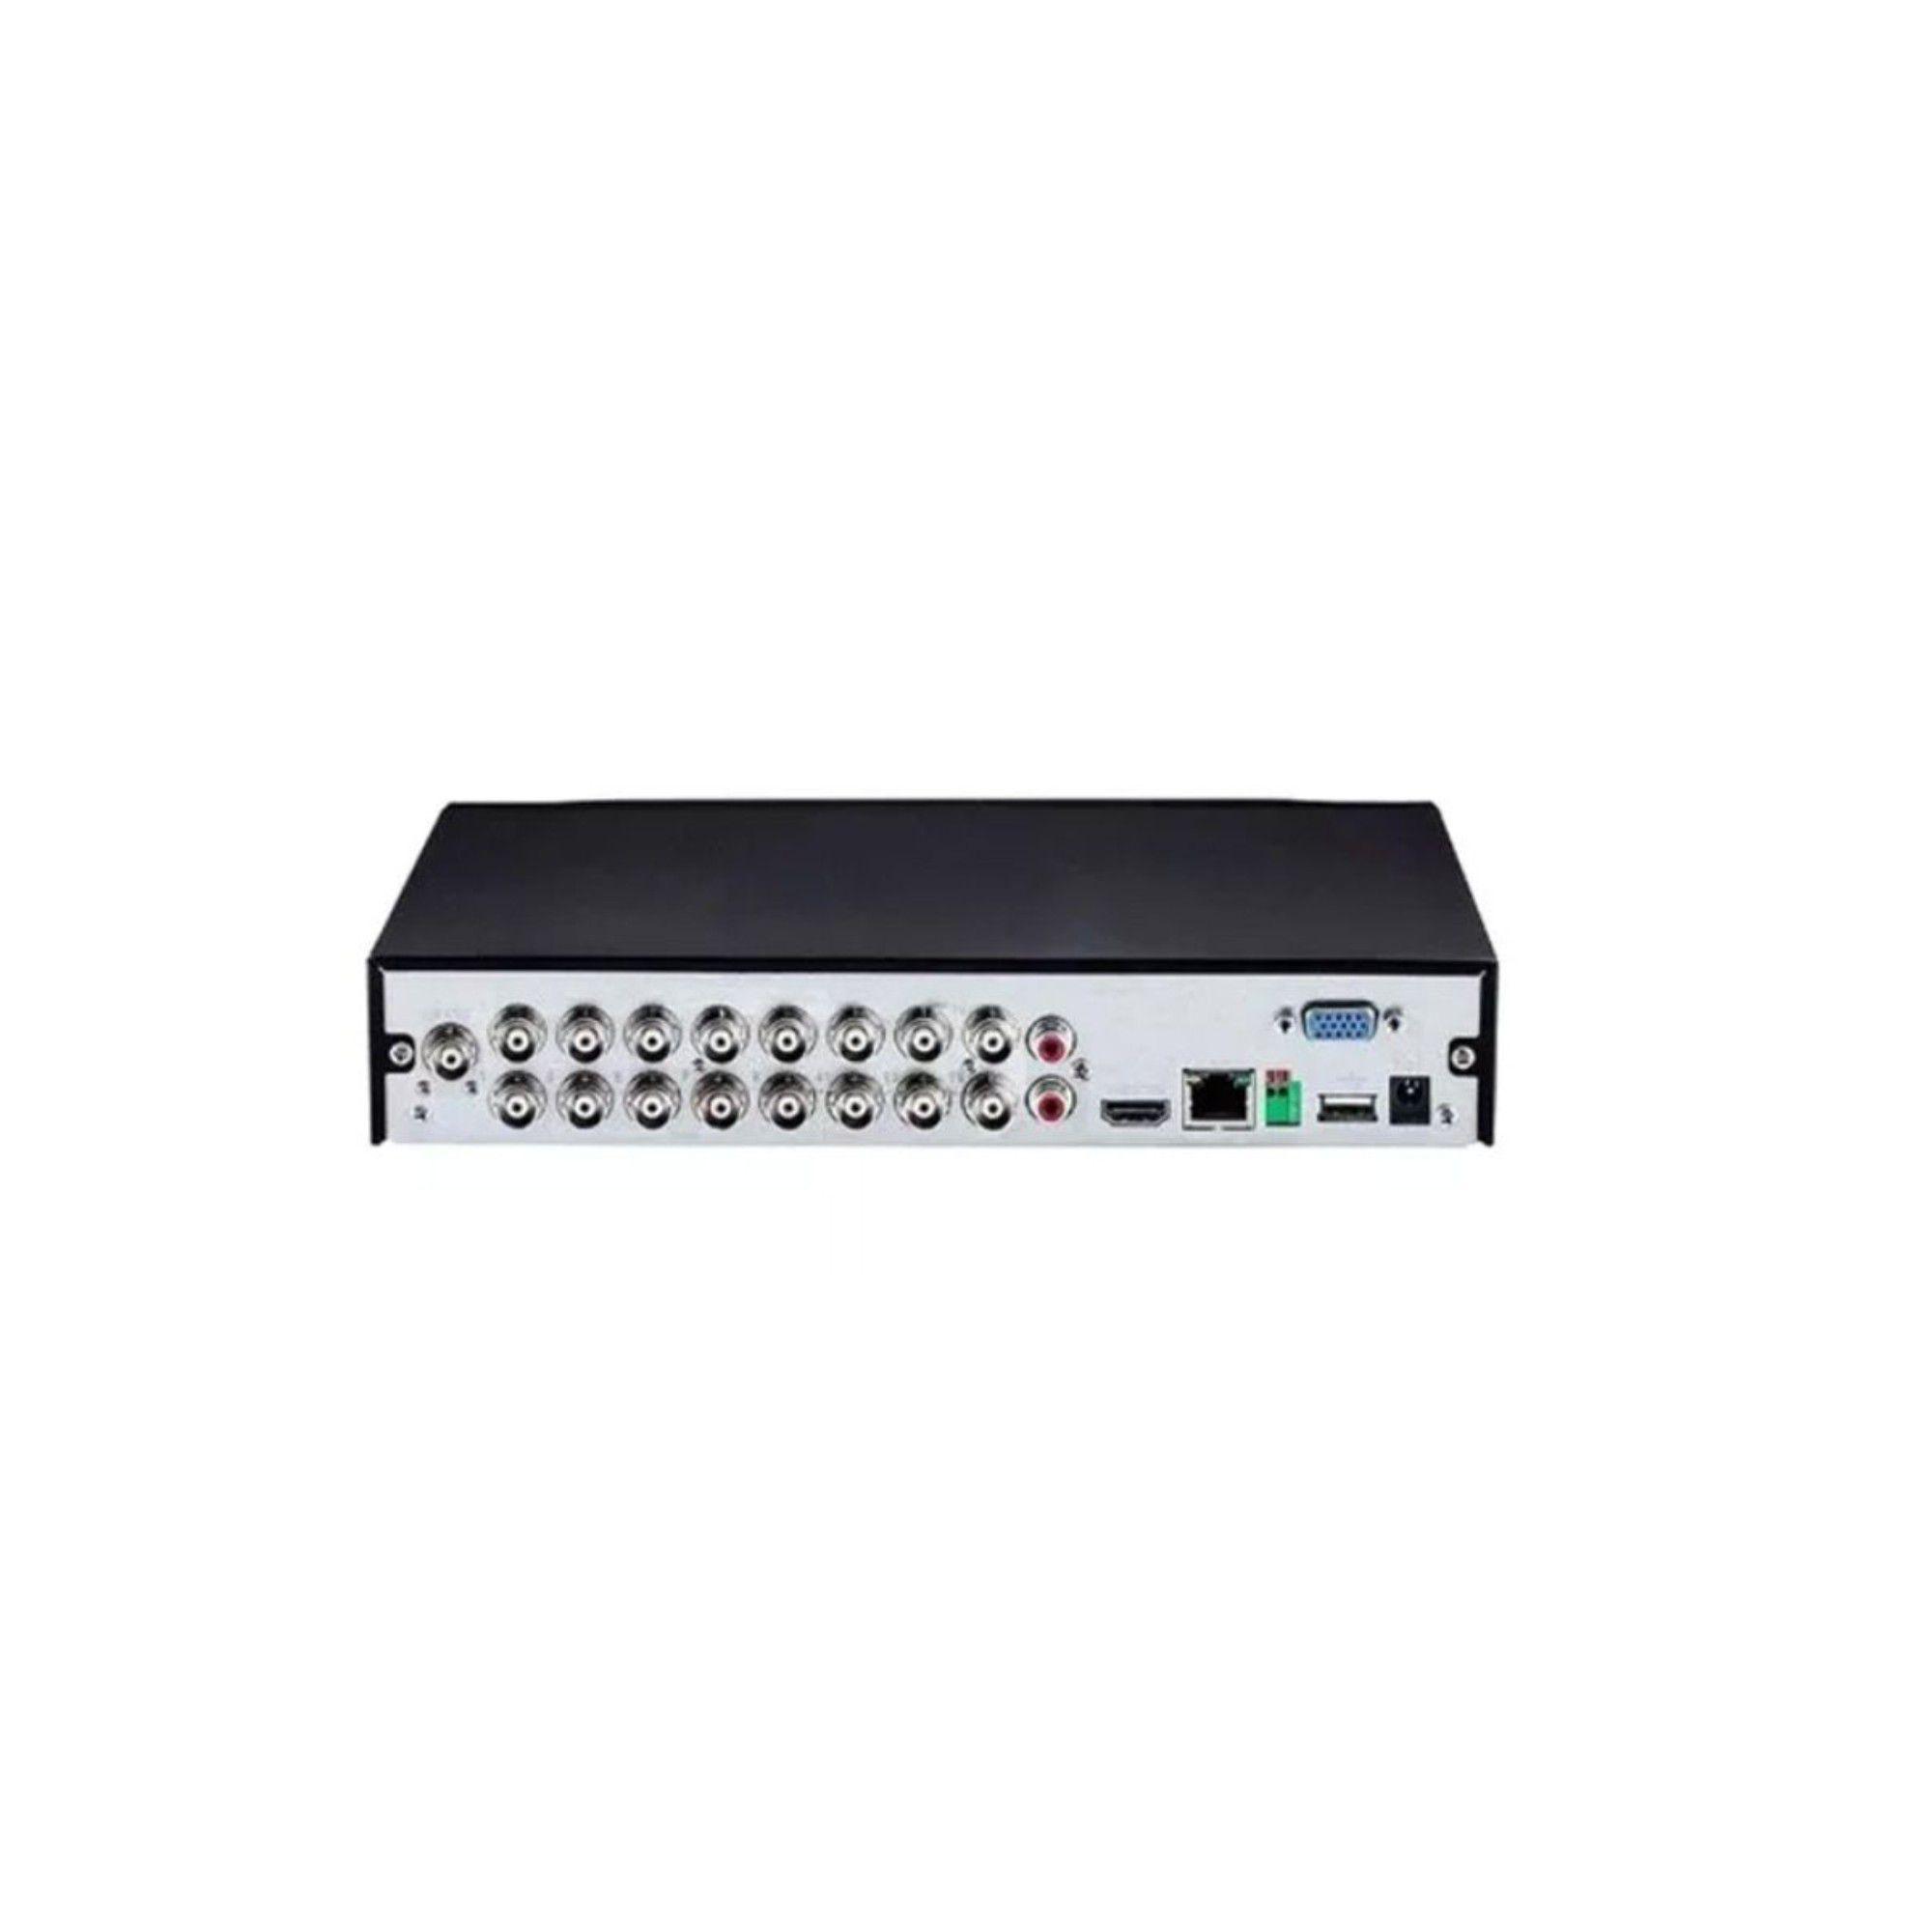 Dvr 16 Canais Multi Hd Mhdx 3116 Full Hd 1080p Intelbras